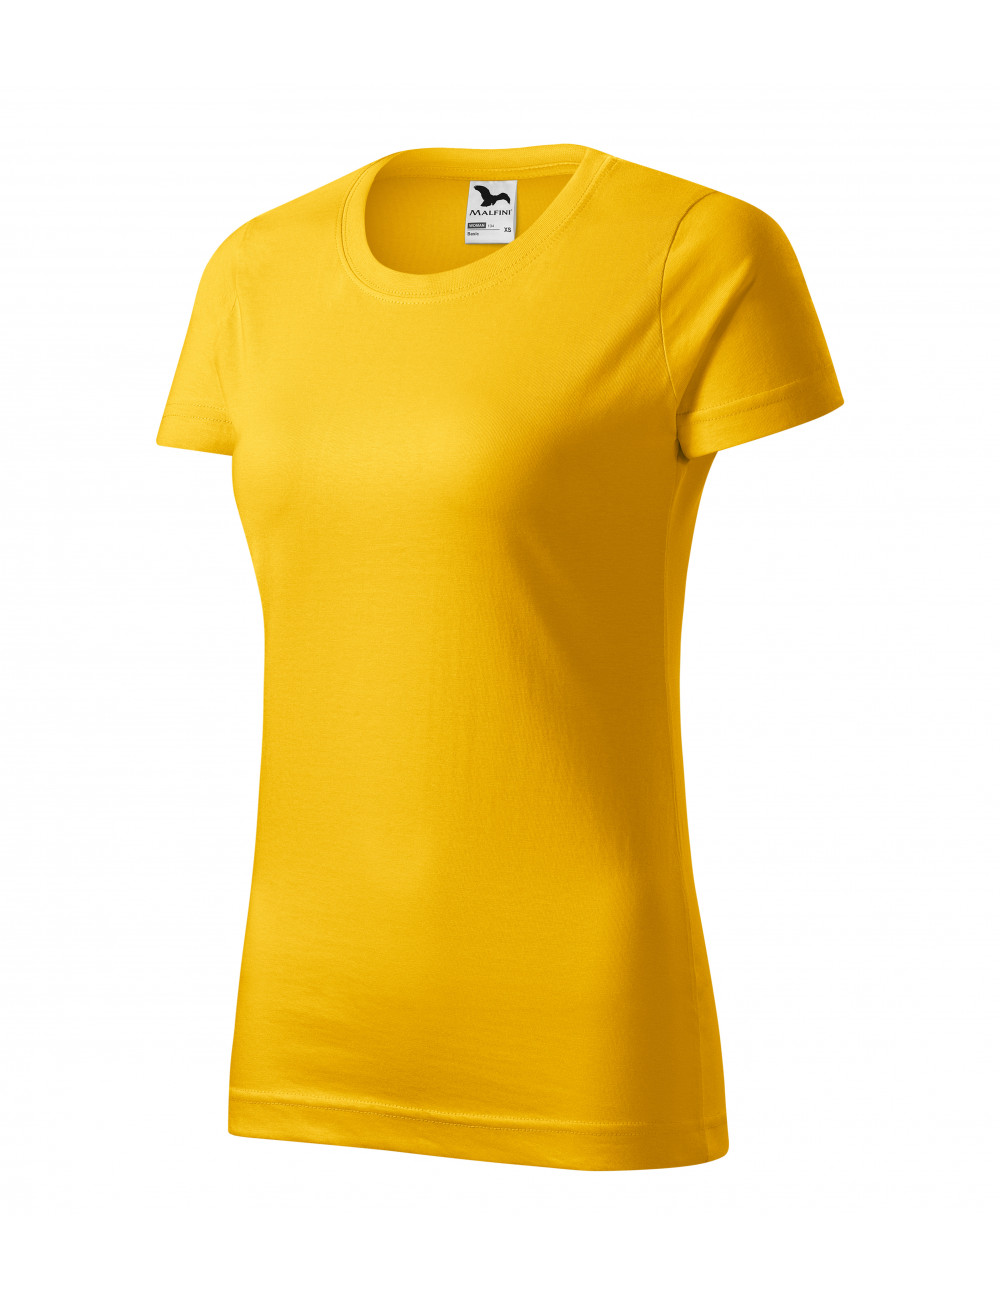 Adler MALFINI Koszulka damska Basic 134 żółty